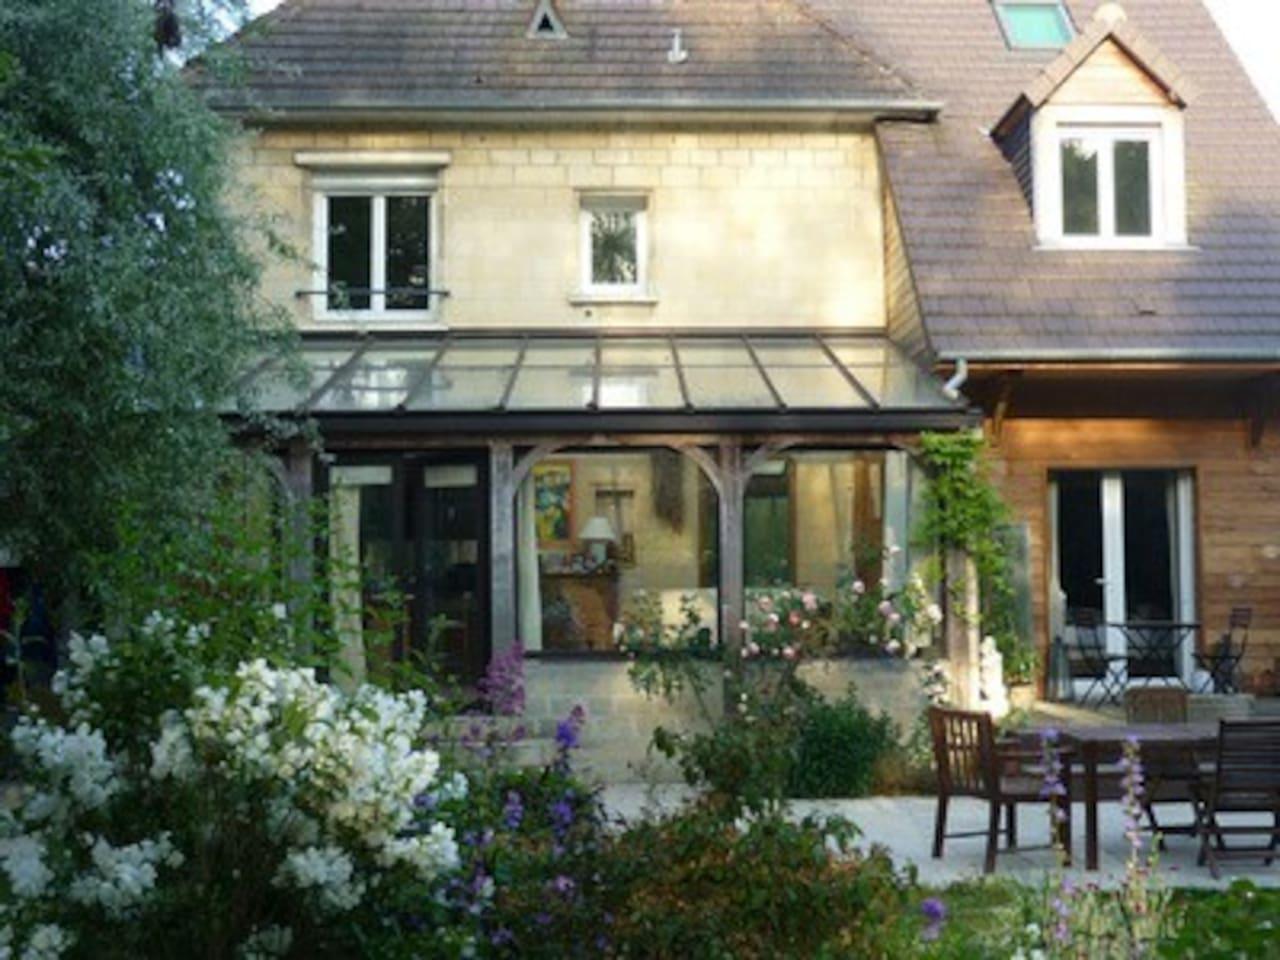 Jardin de 1000 m2. Our big garden.